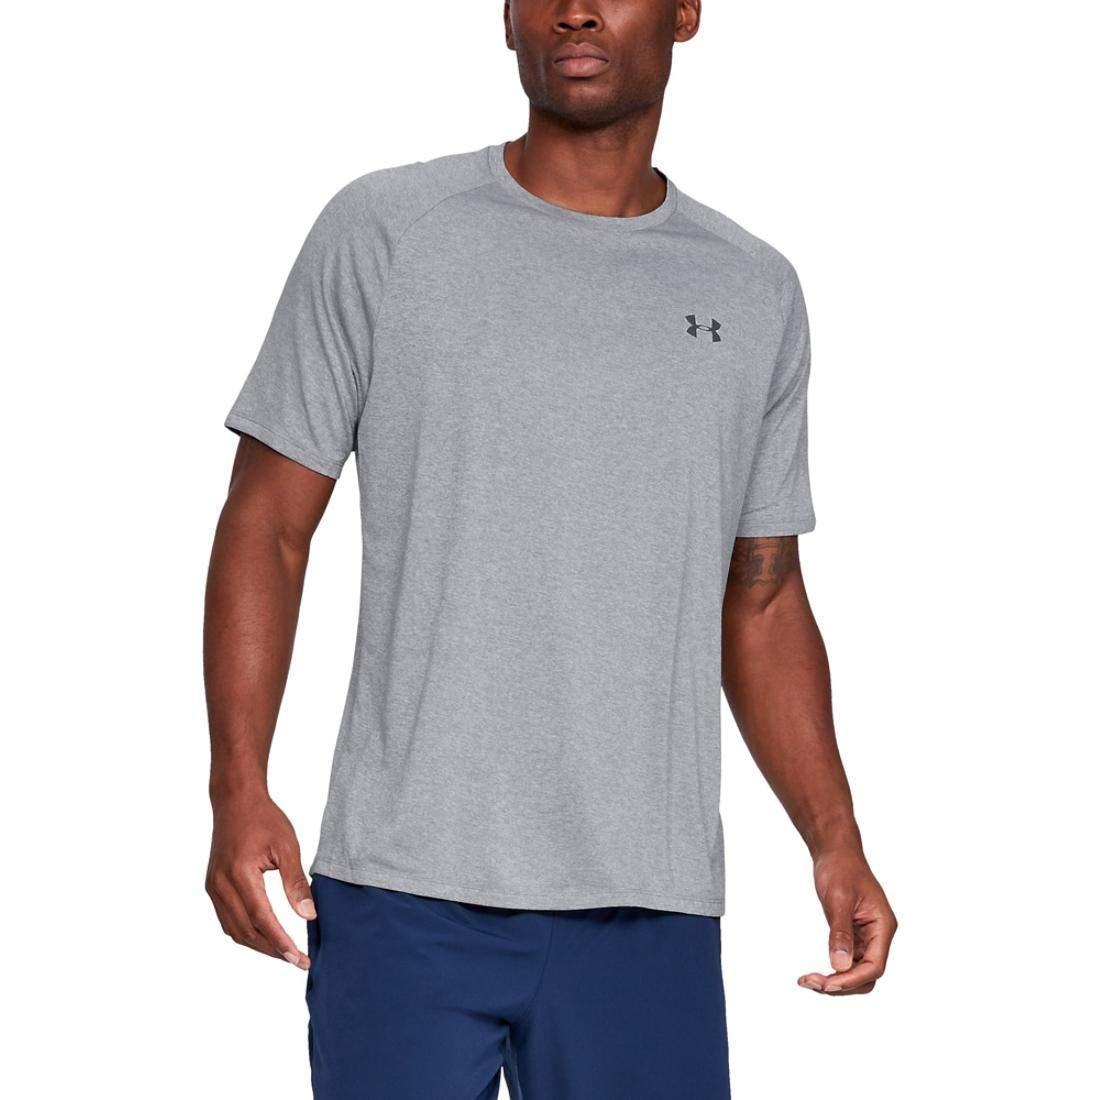 Under Armour Men's UA Tech Short Sleeve Tee 2.0, Steel, XS-R